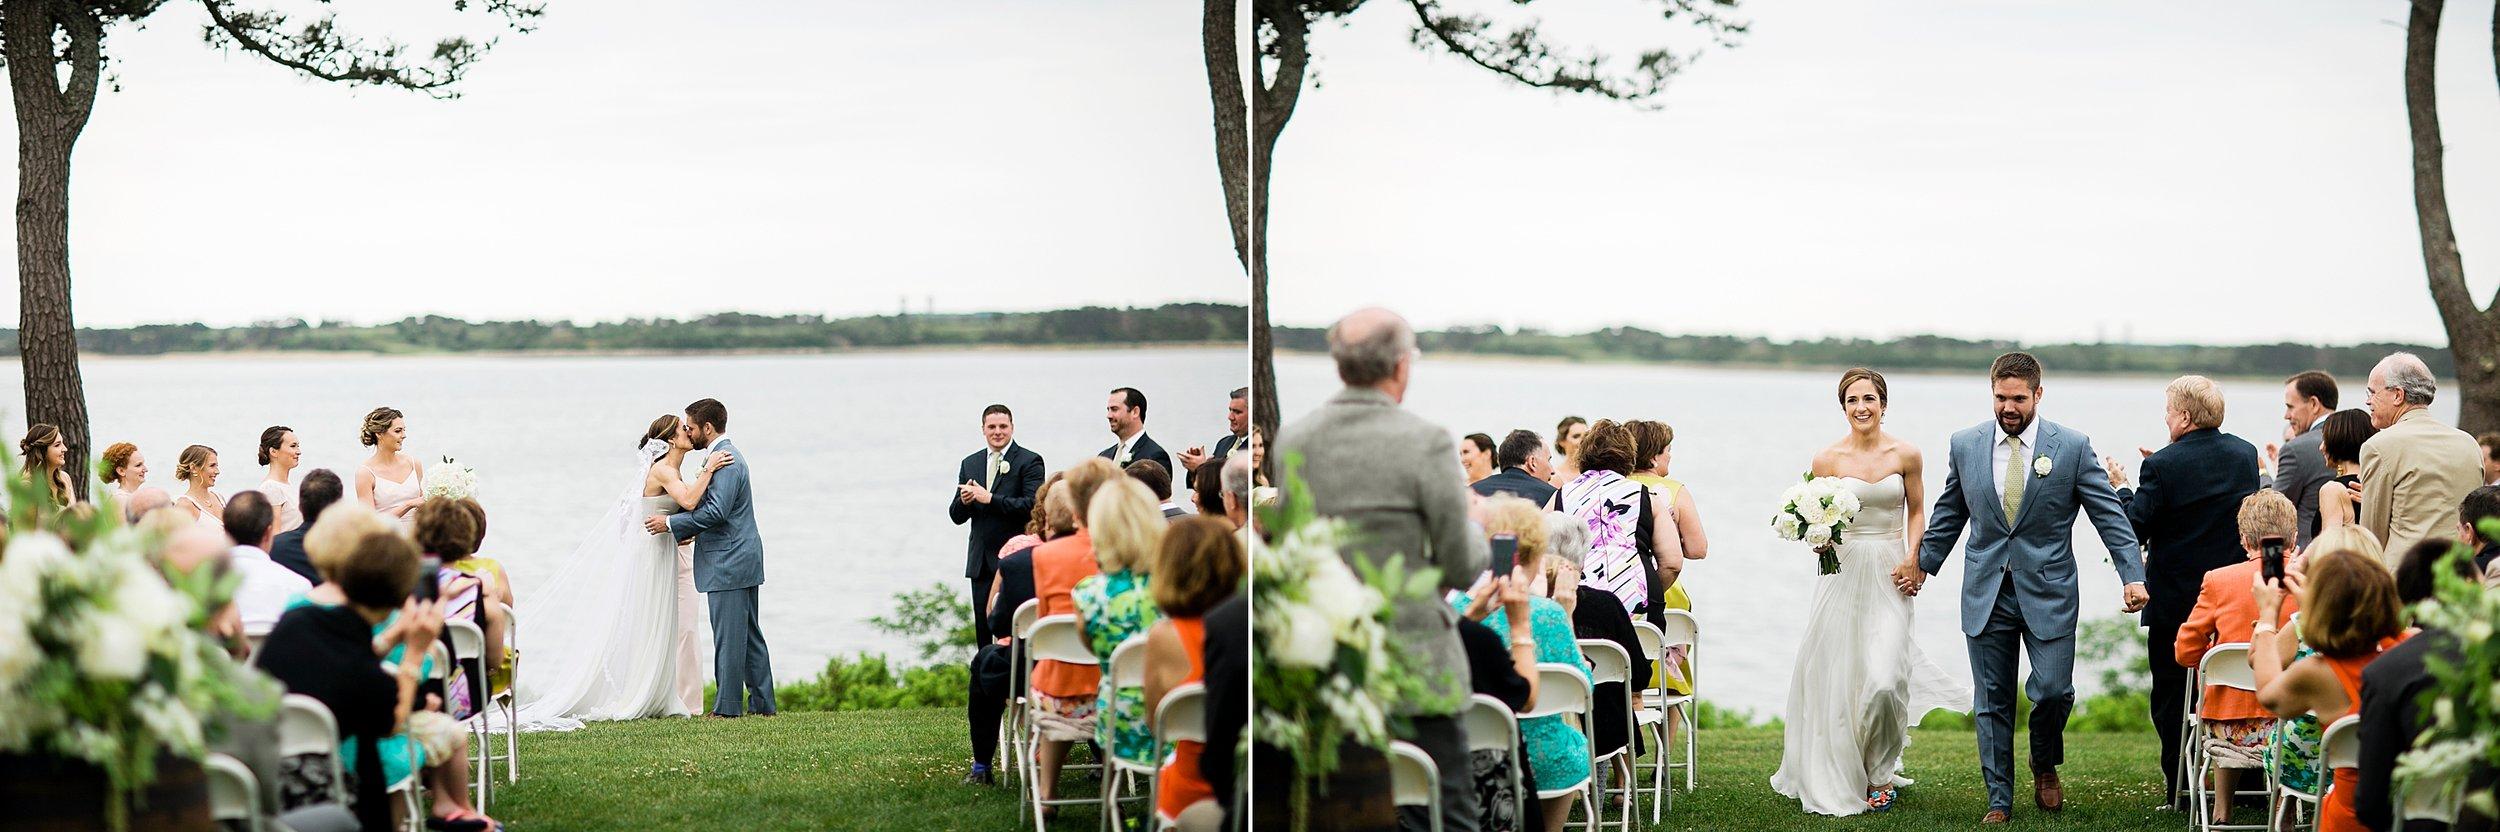 037 los angeles wedding photographer todd danforth photography cape cod.jpg